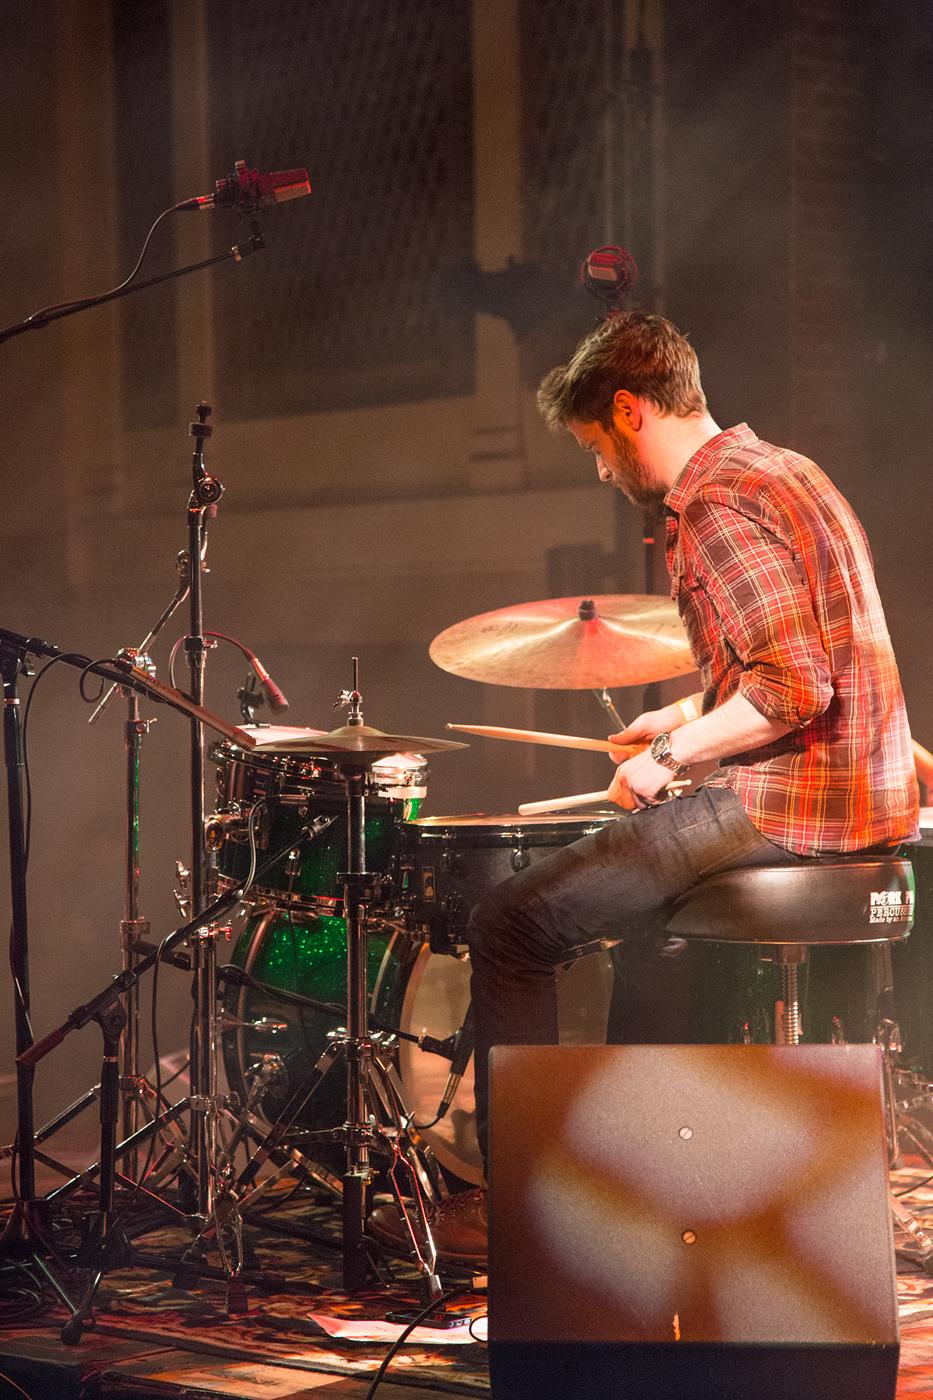 Kevin Etzler Drumming at the Weinberg Center